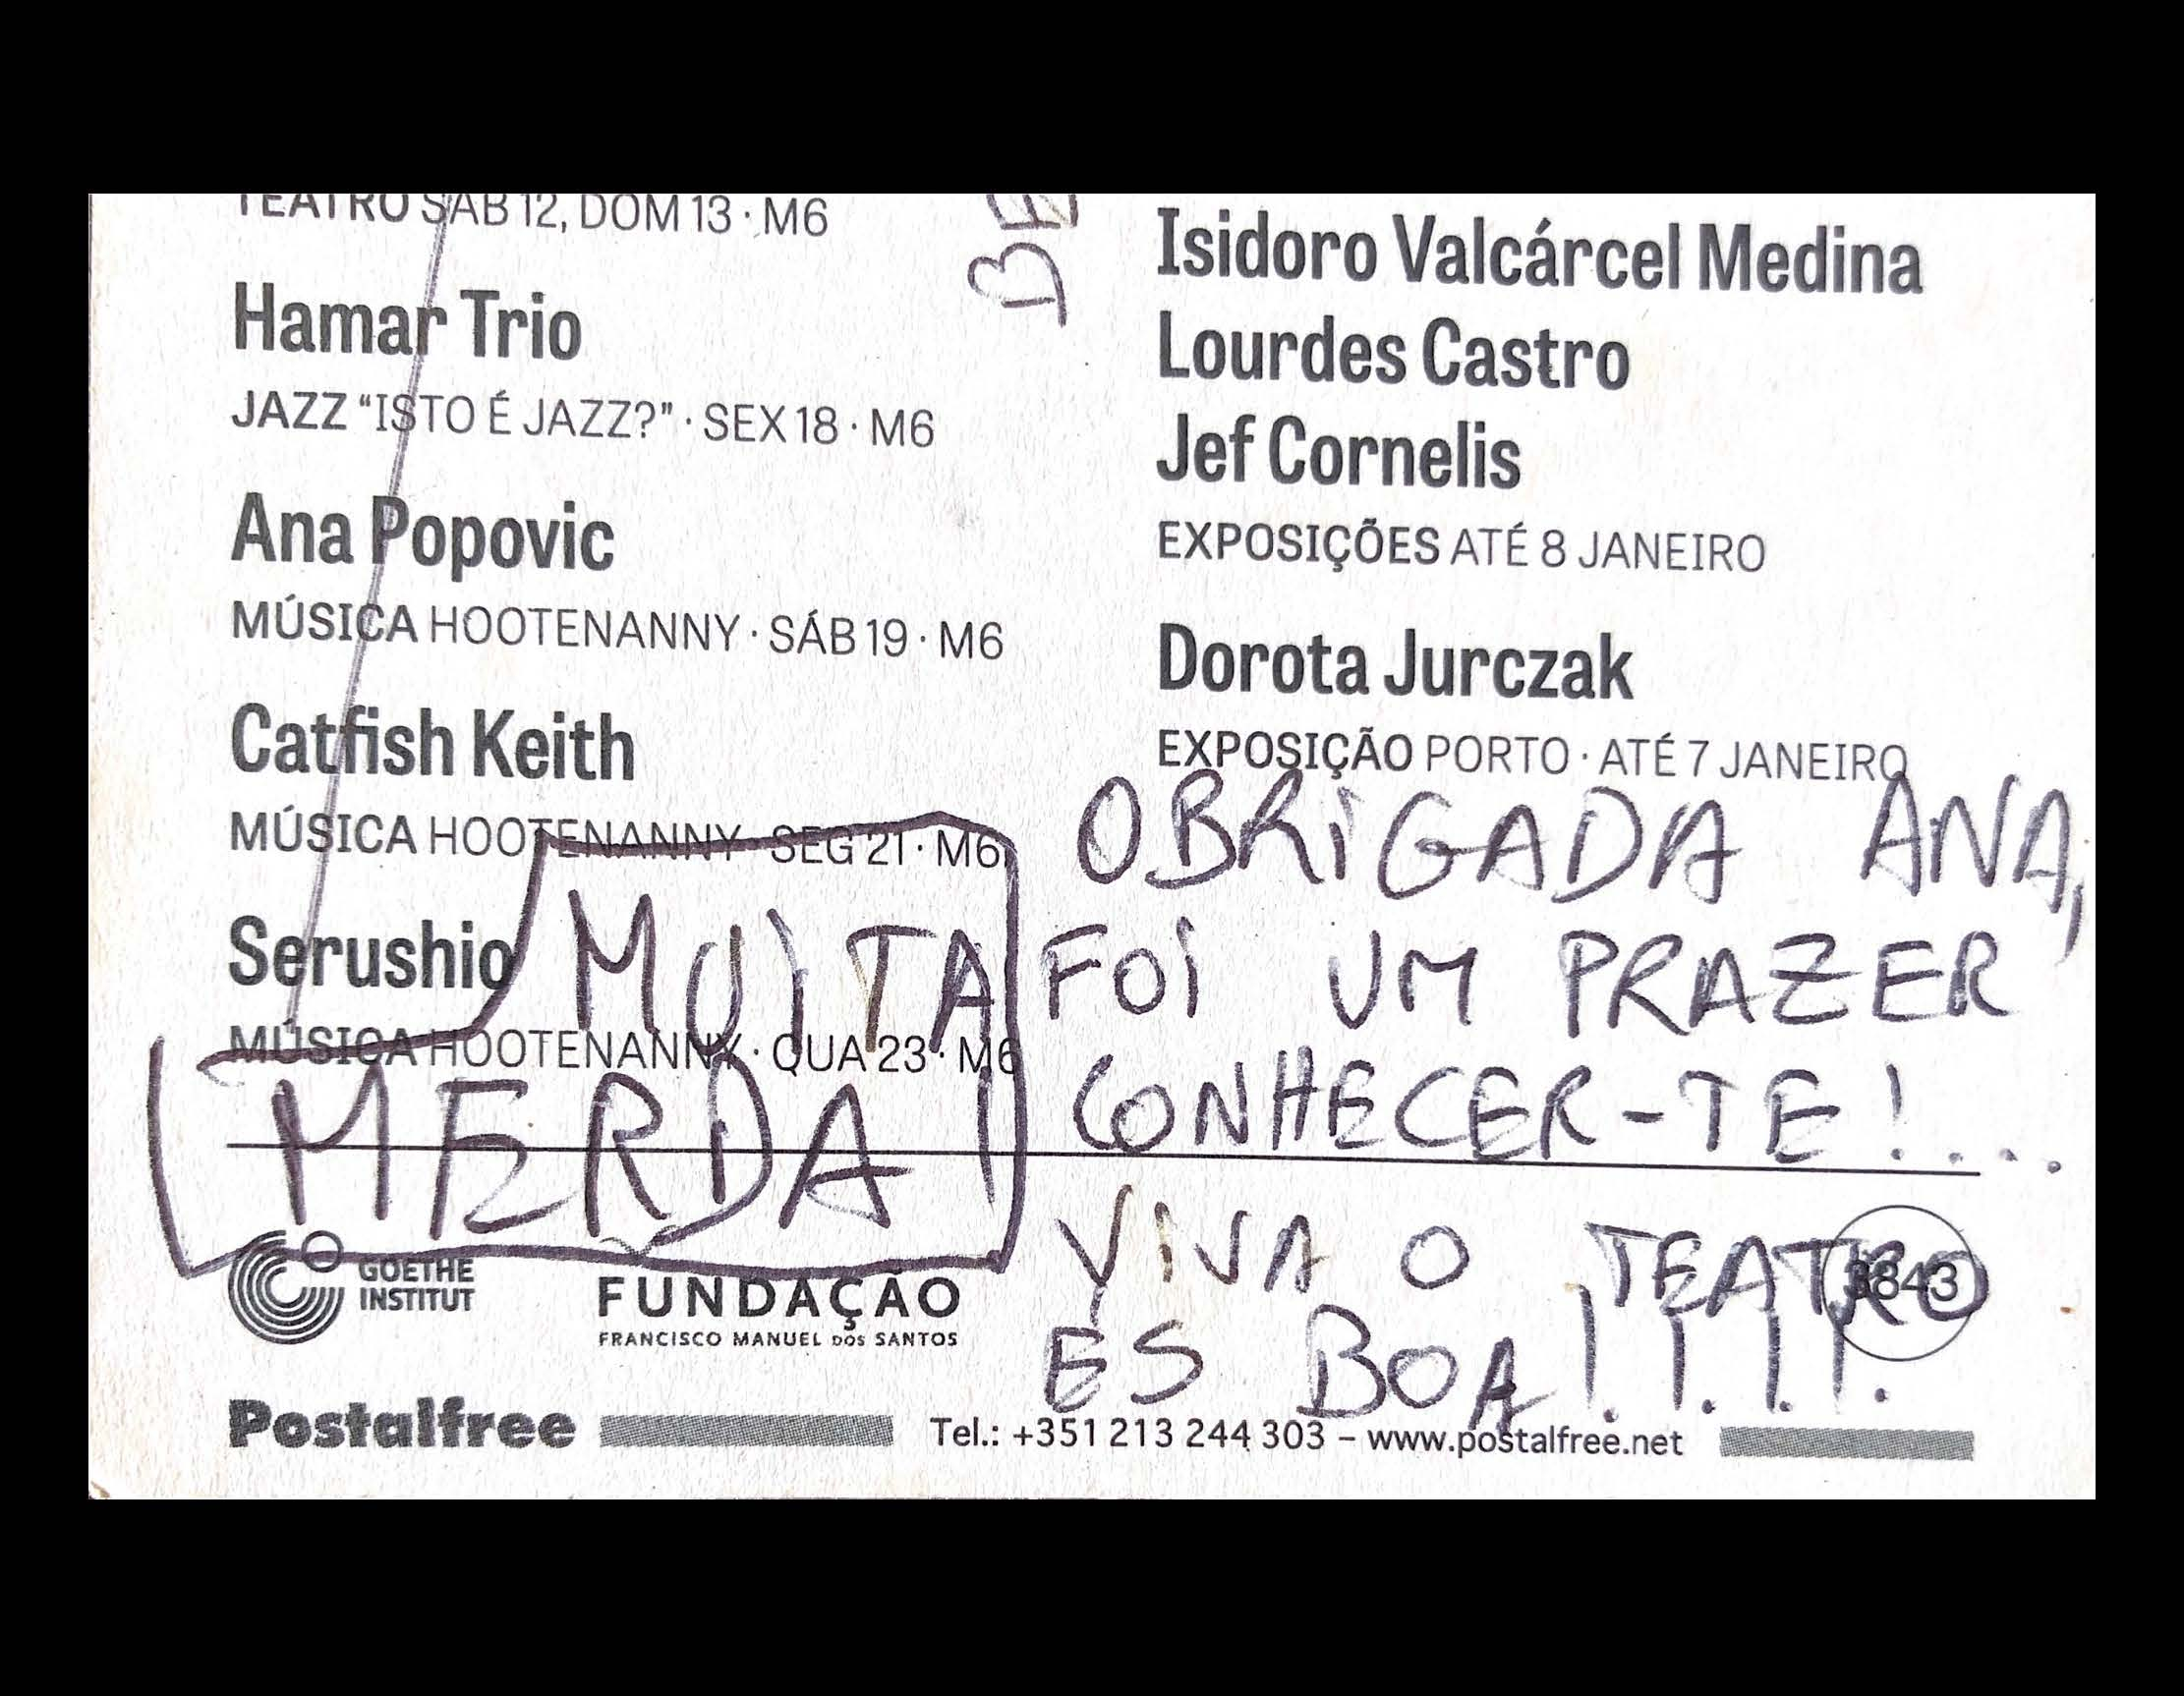 Ana Paula Rocha - Testemunhos - 011